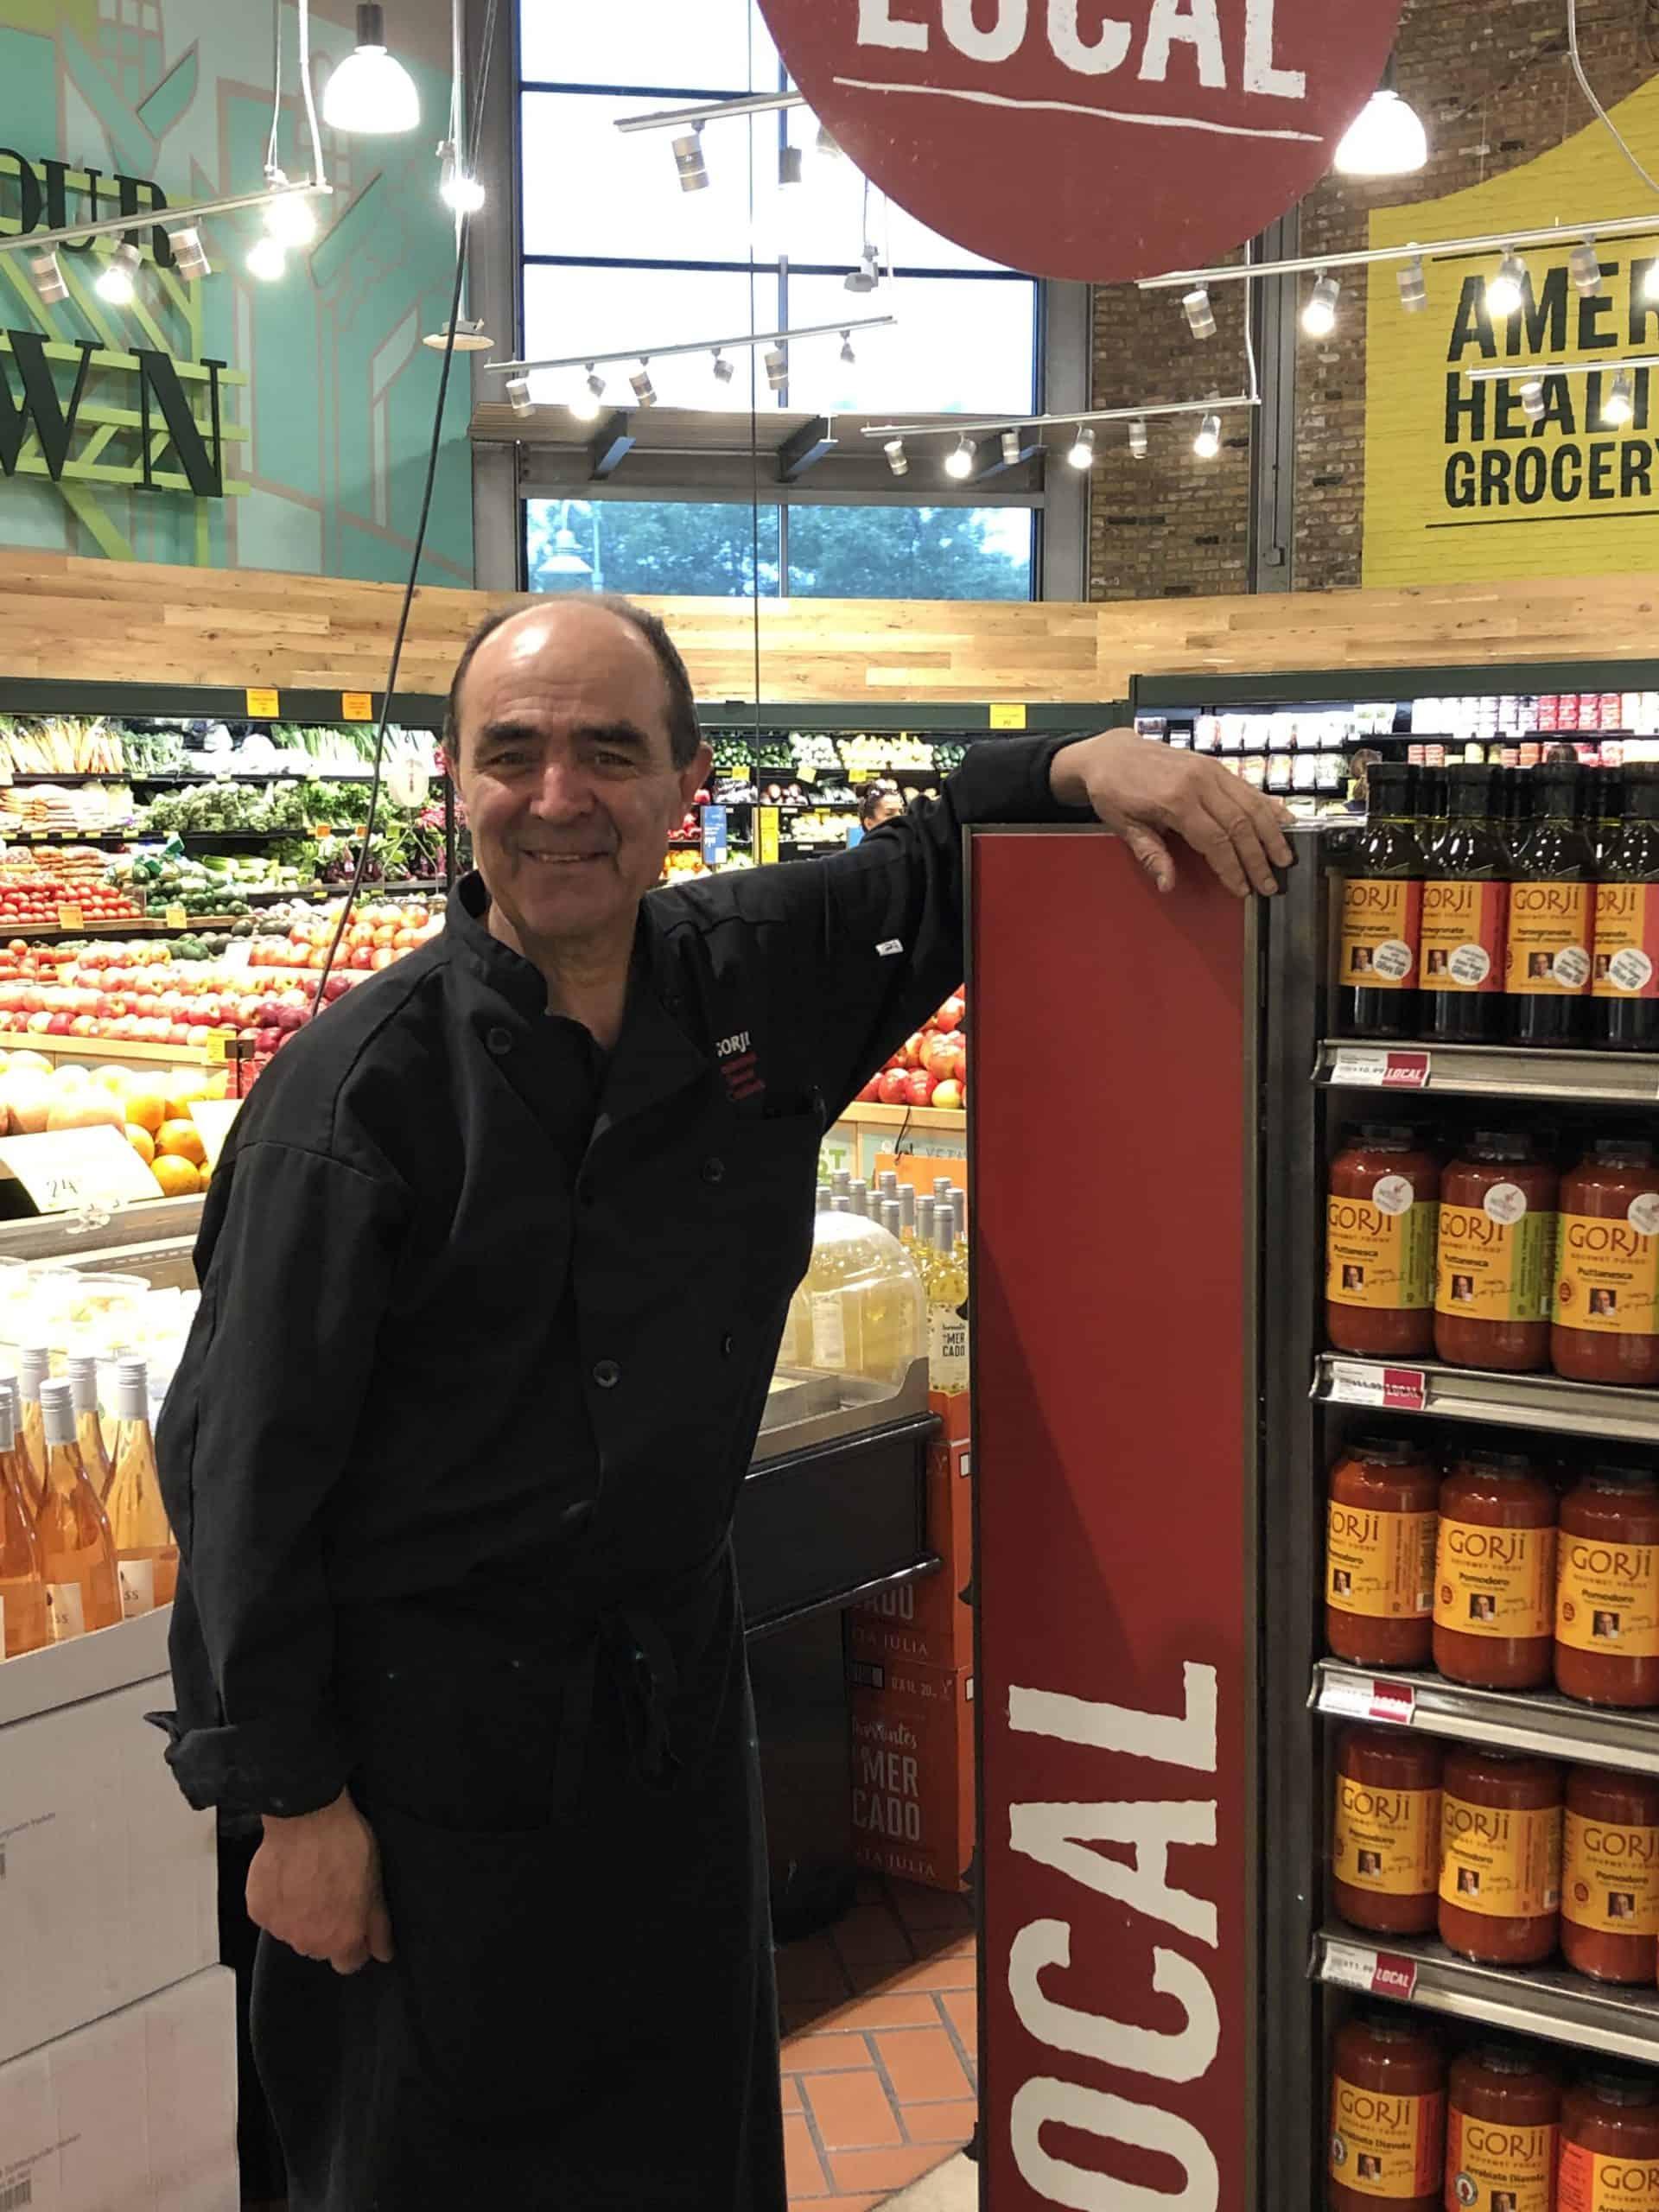 Chef Gorji standing by mobile display of Gorji Gourmet sauces.